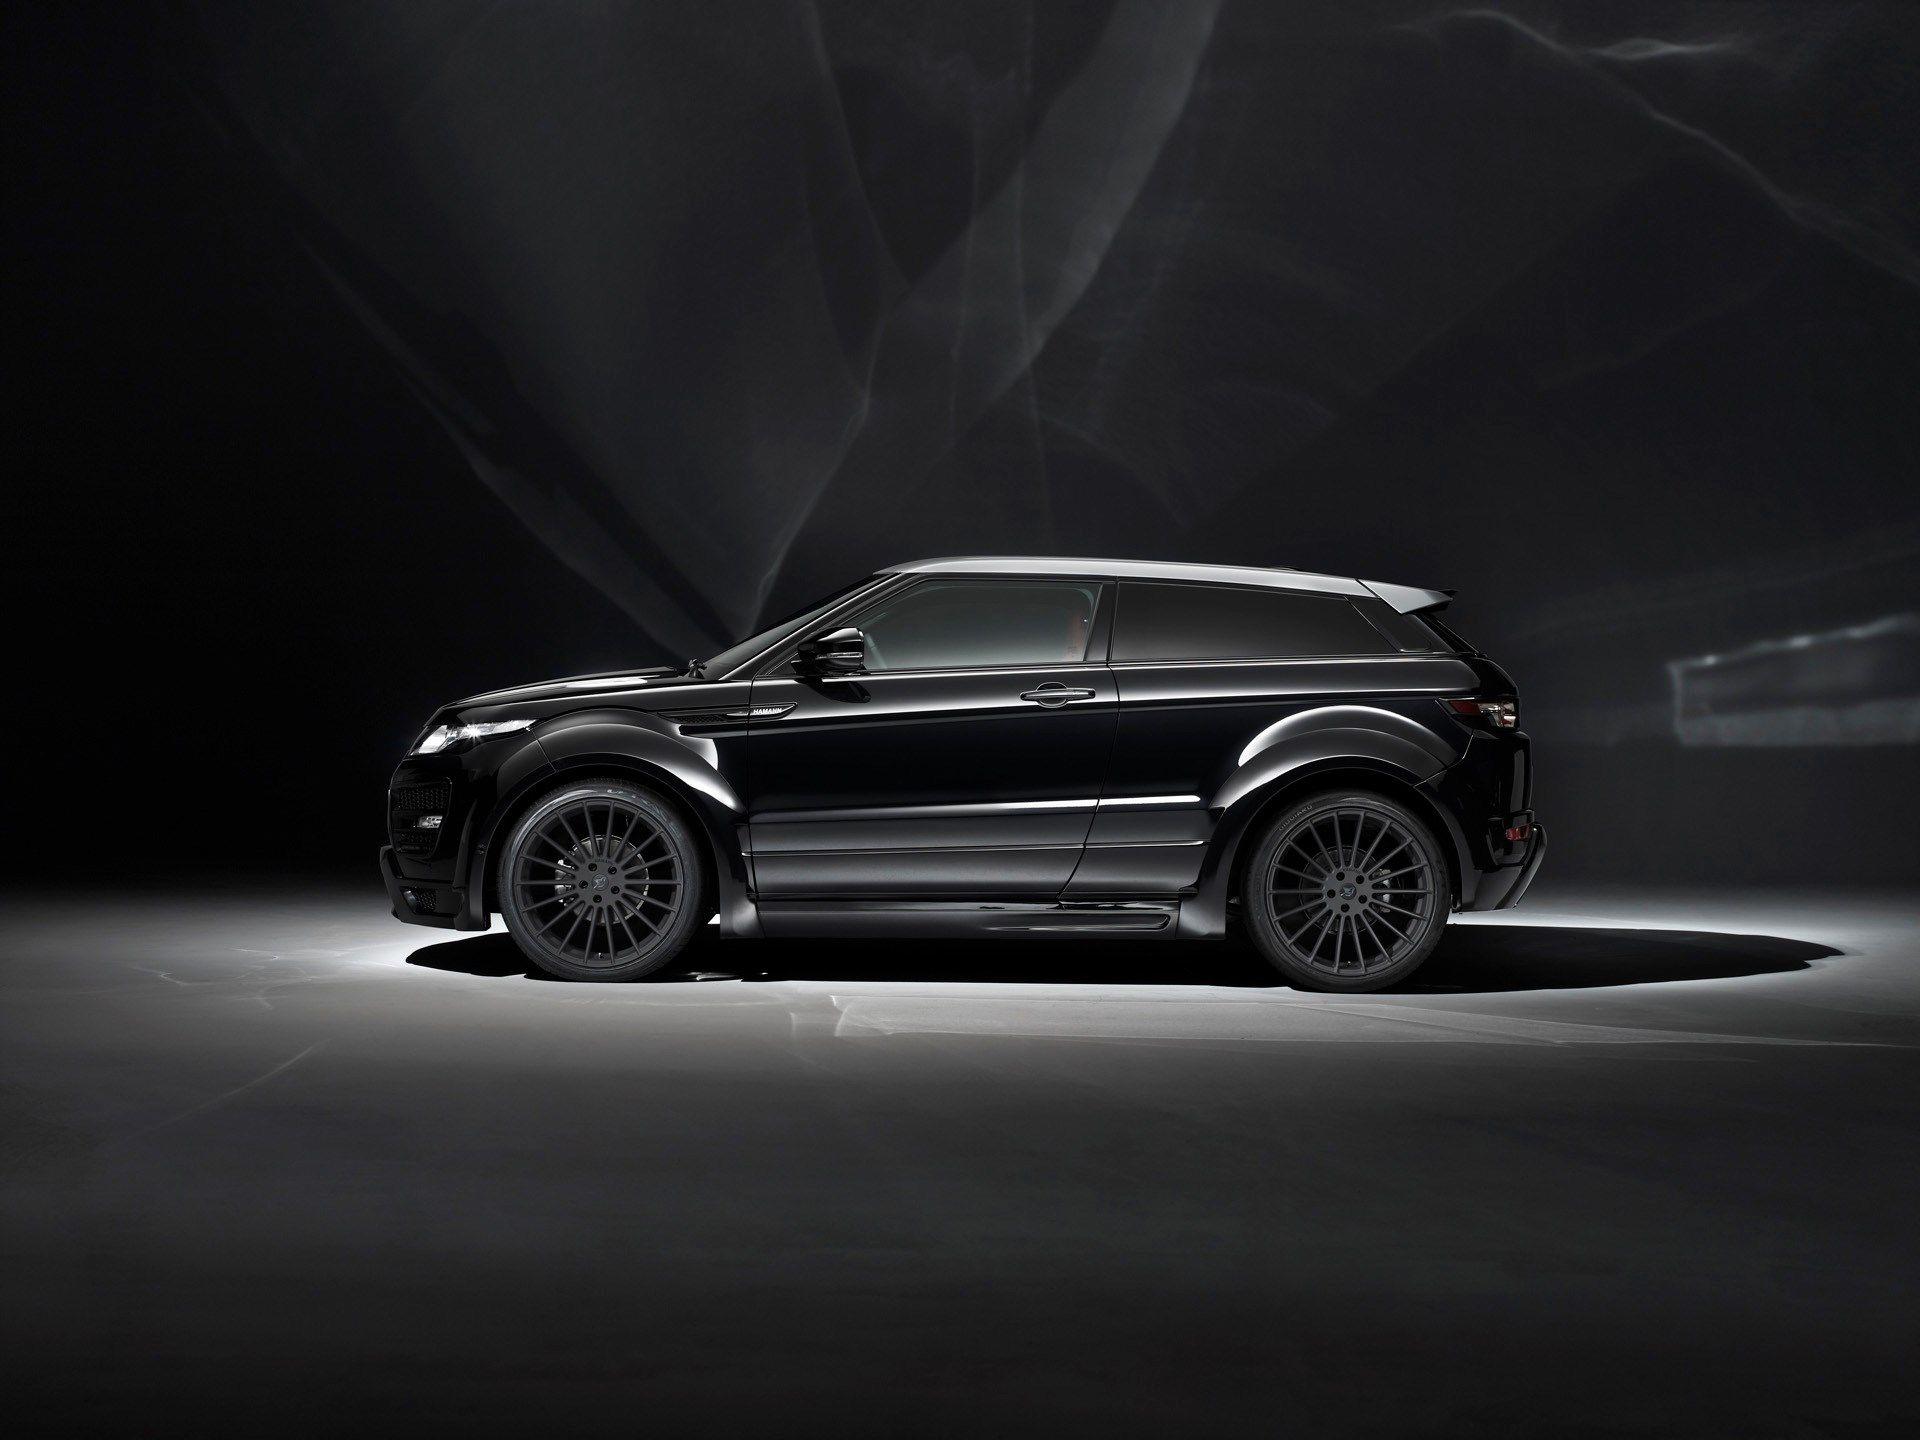 Hd Range Rover Evoque Wallpapers